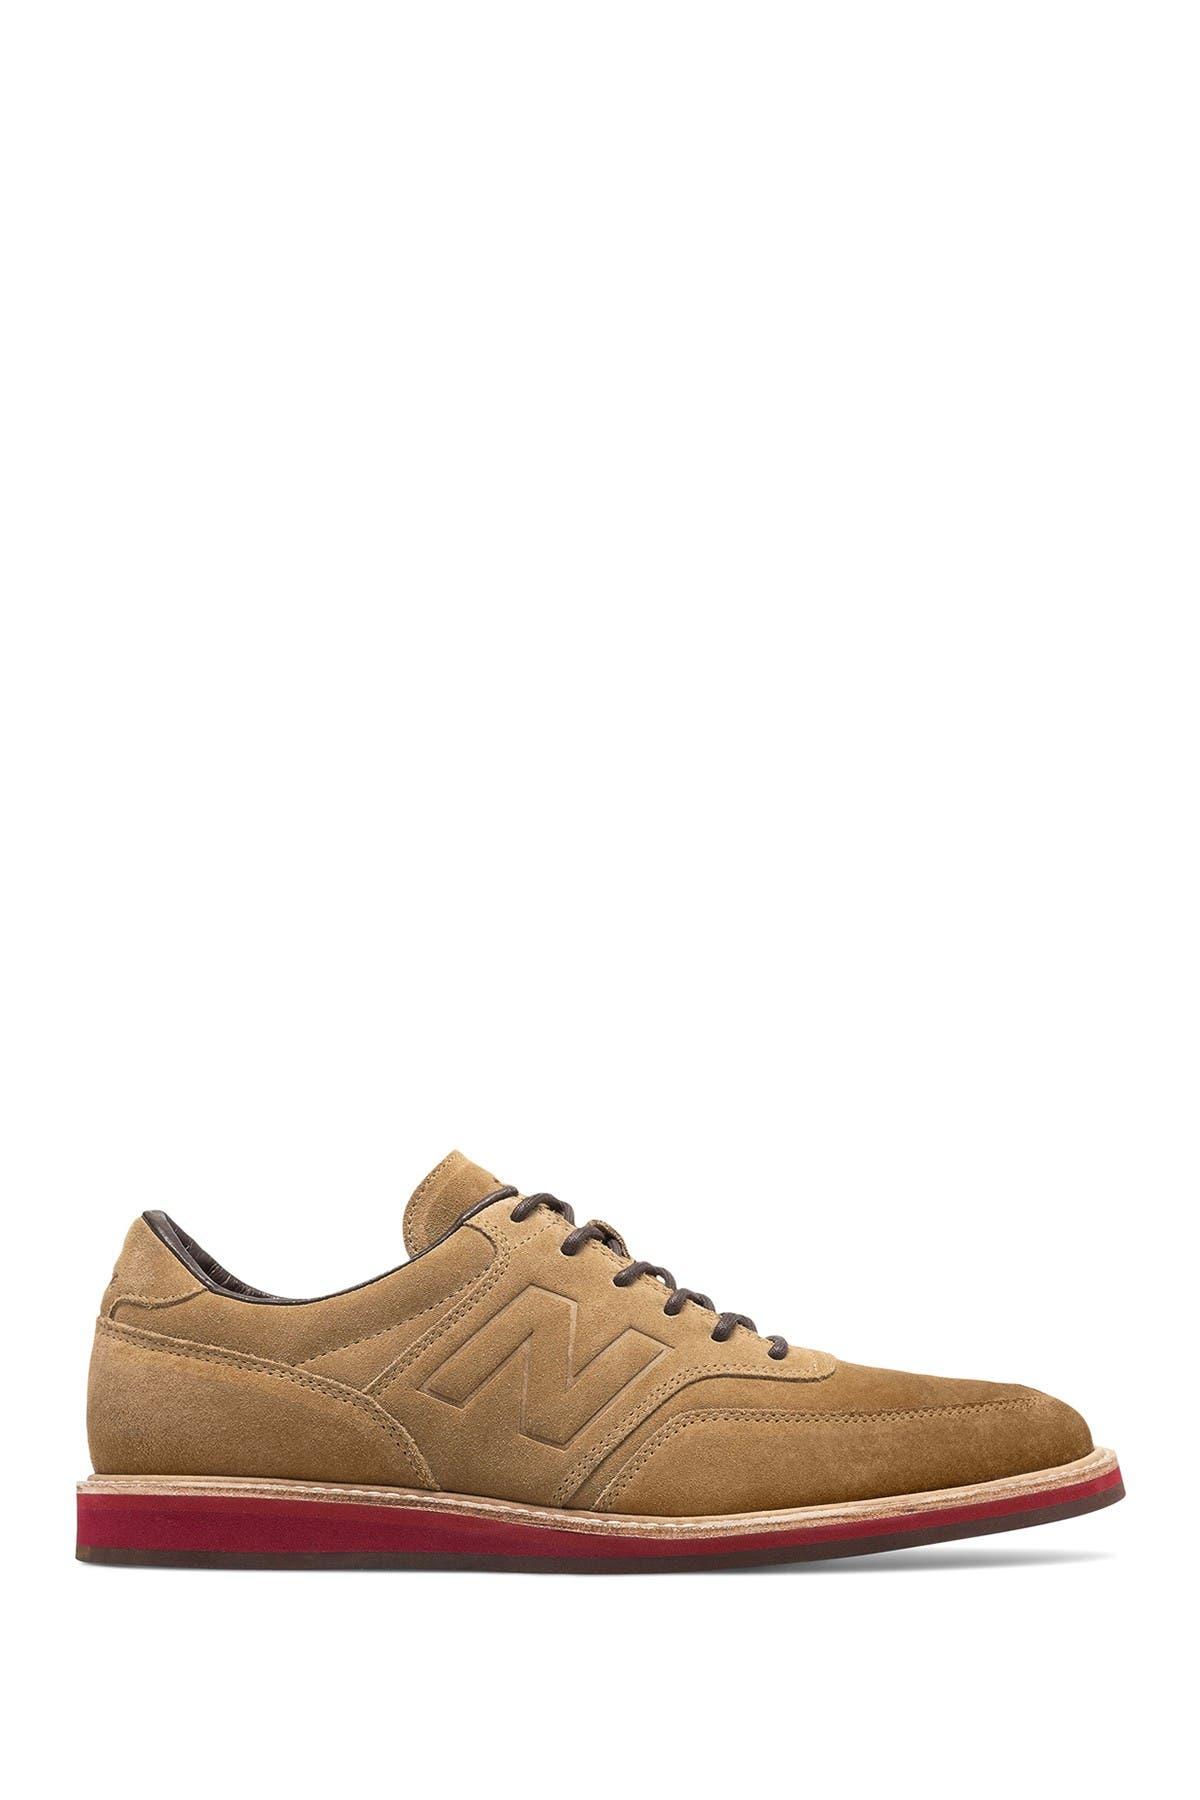 Image of New Balance 1100 Casual Shoe